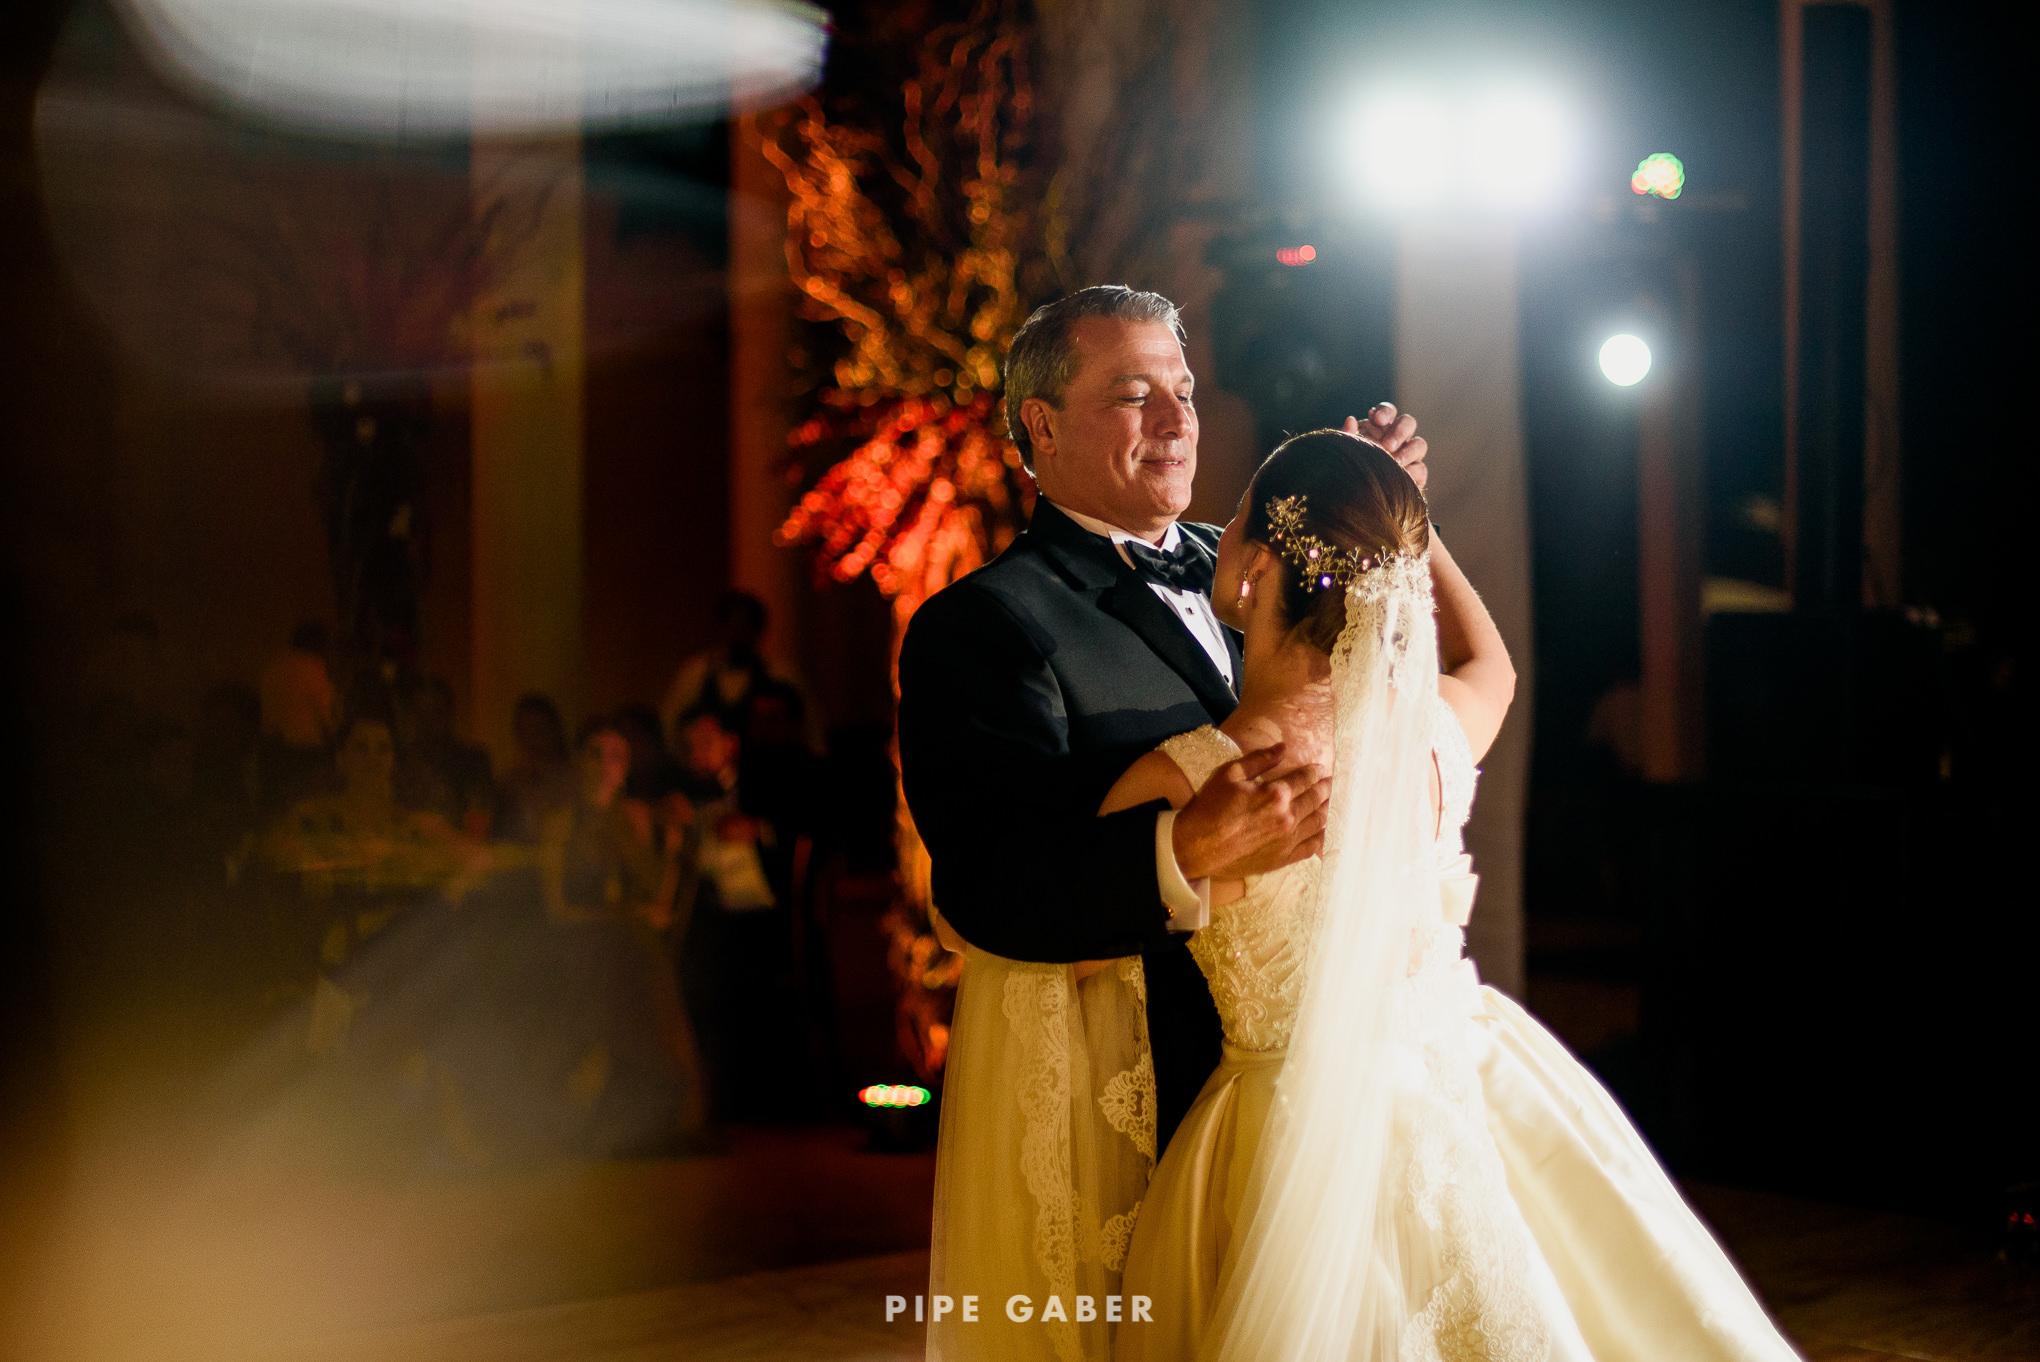 17_02_18_WEDDING_AIDITA_NEZBIT_MIGUEL_DOGRE_294_web.jpg